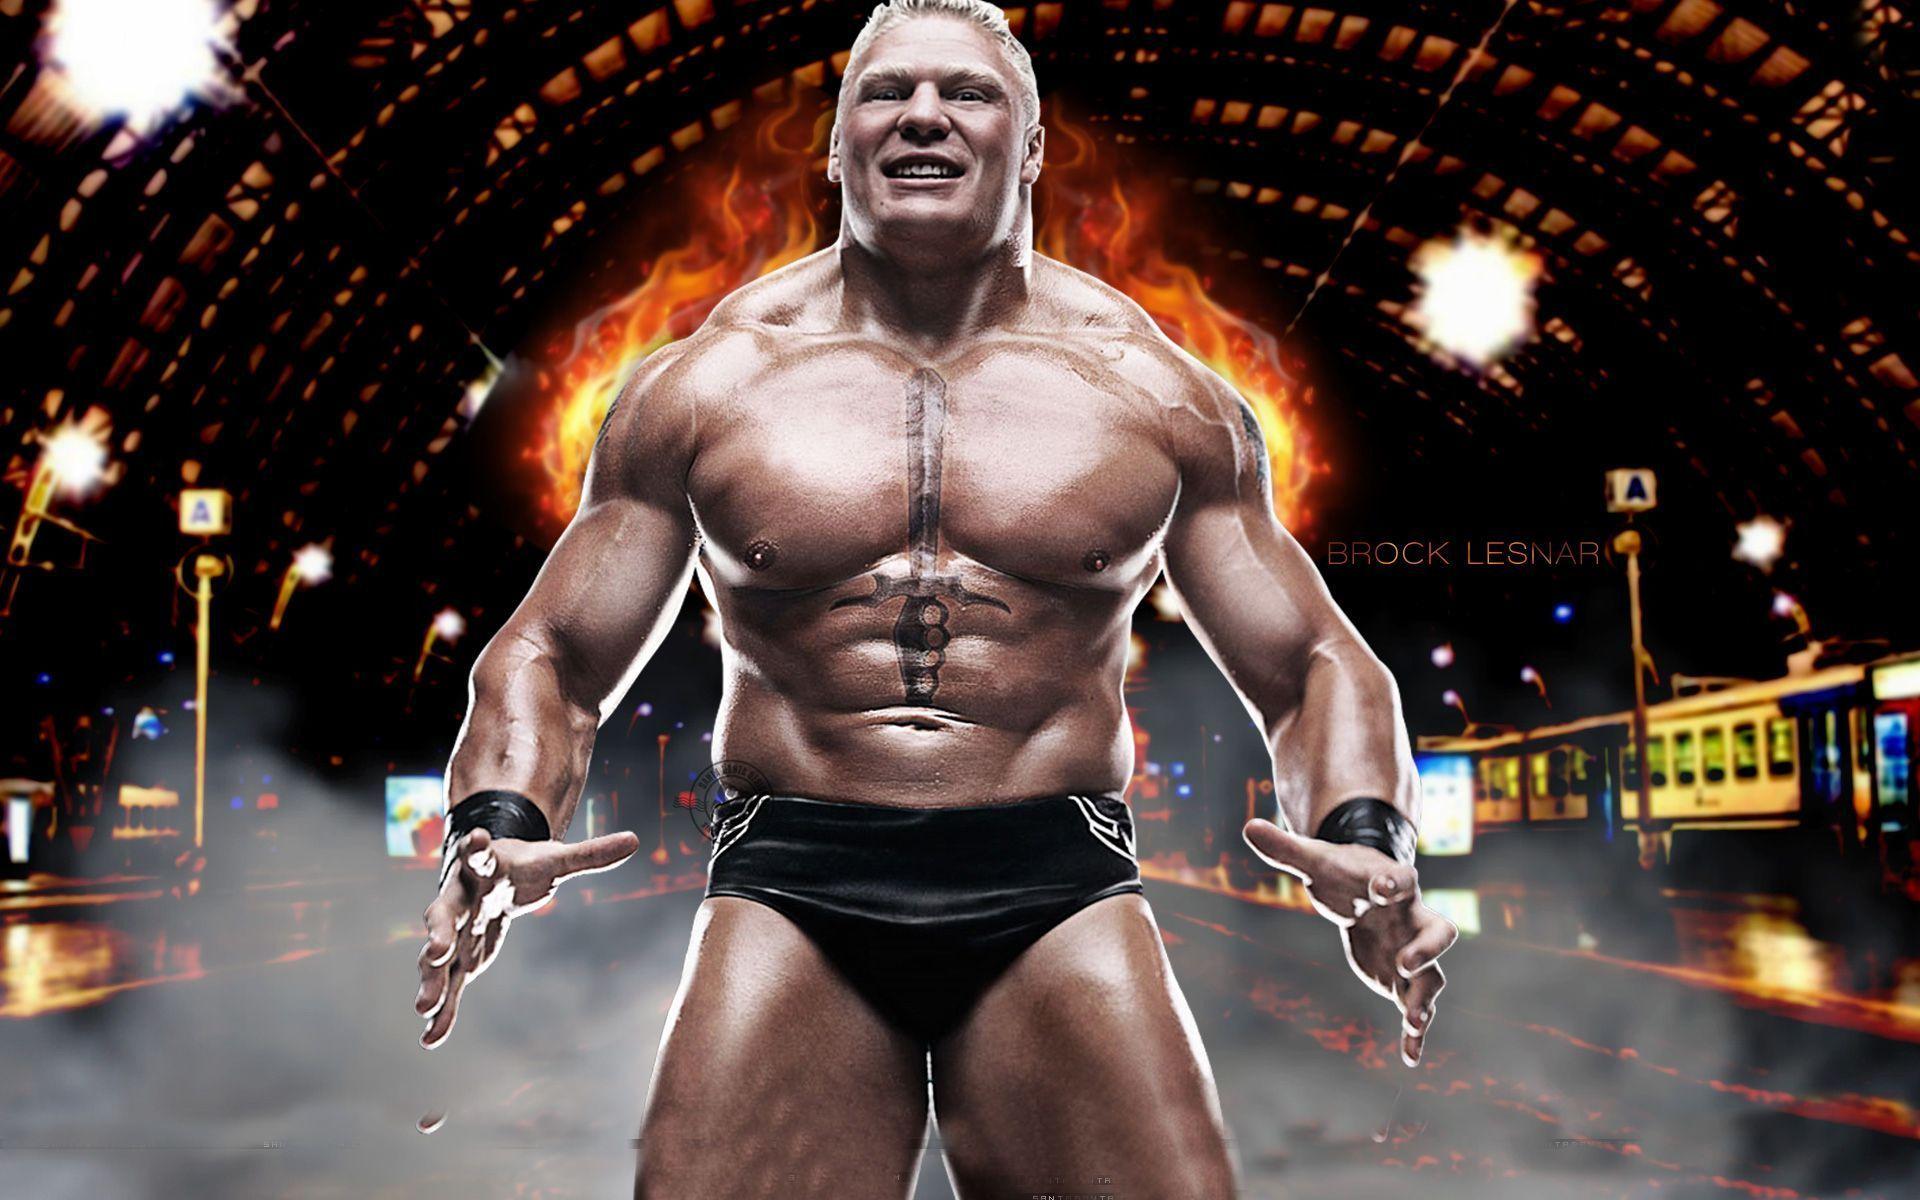 Brock Lesnar Hd Background 10 Brock Lesnar Wwe Brock Kane Wwe